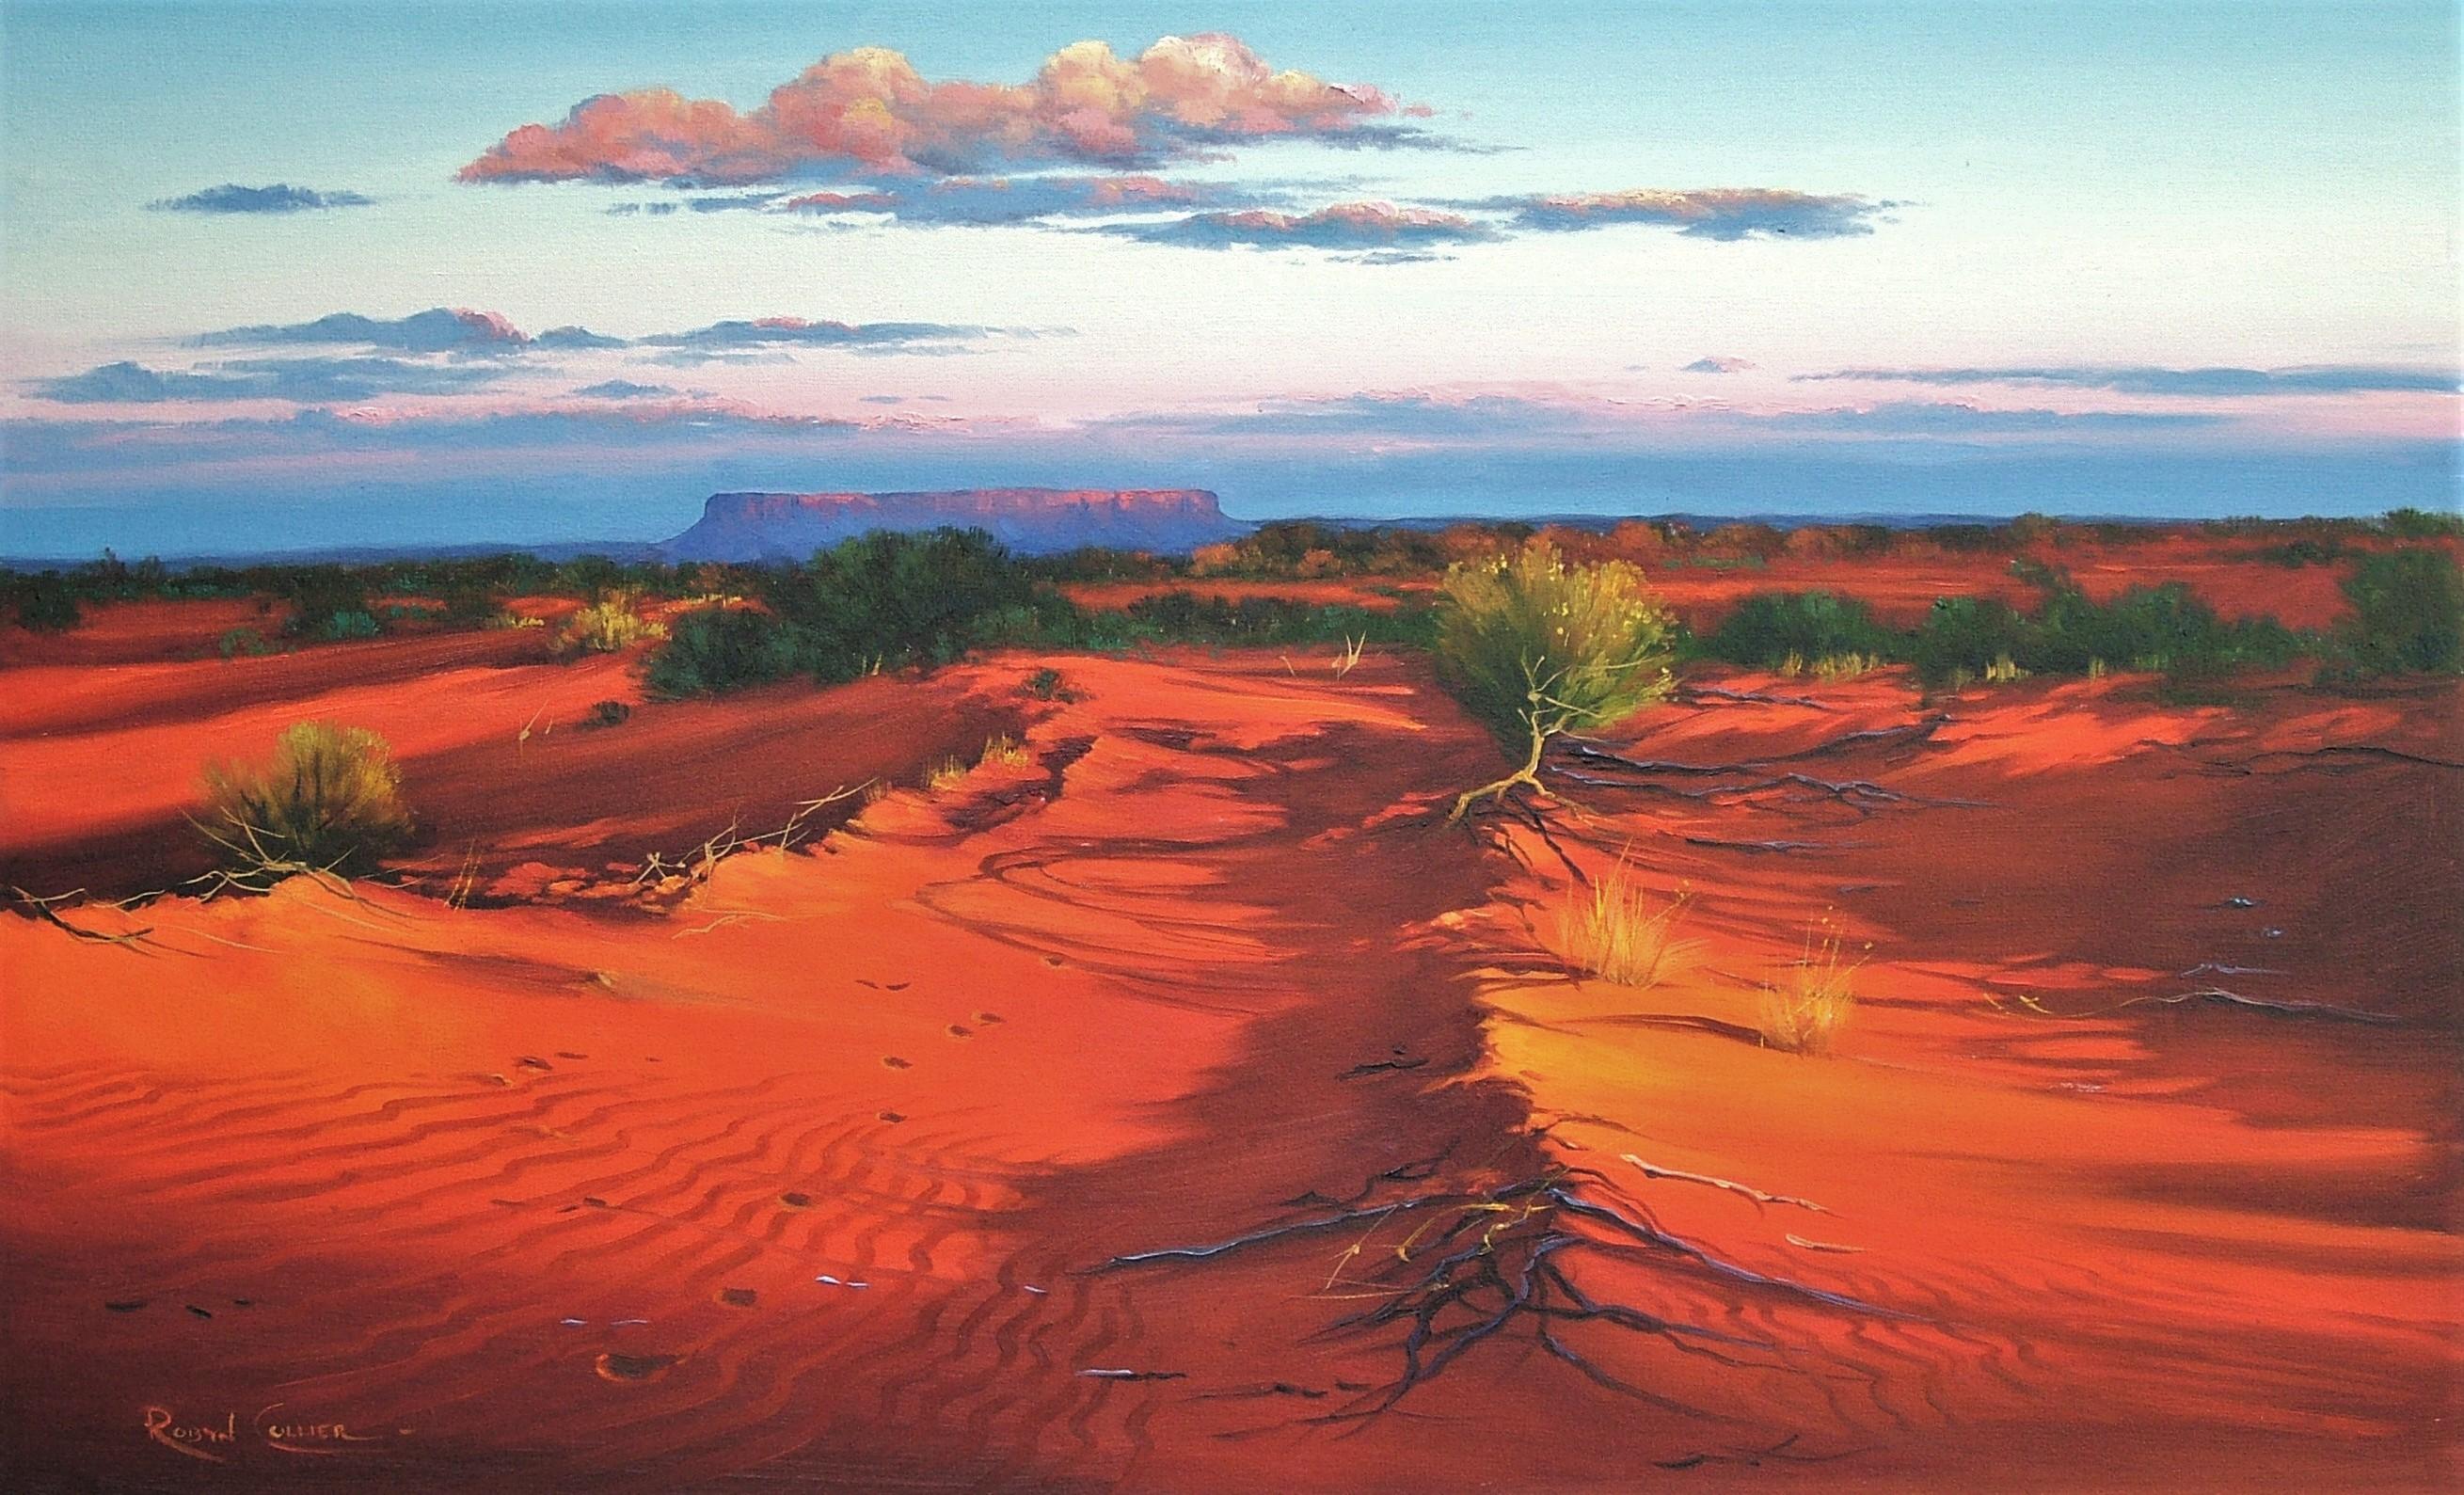 CENTRAL AUSTRALIA 5-17th JULY